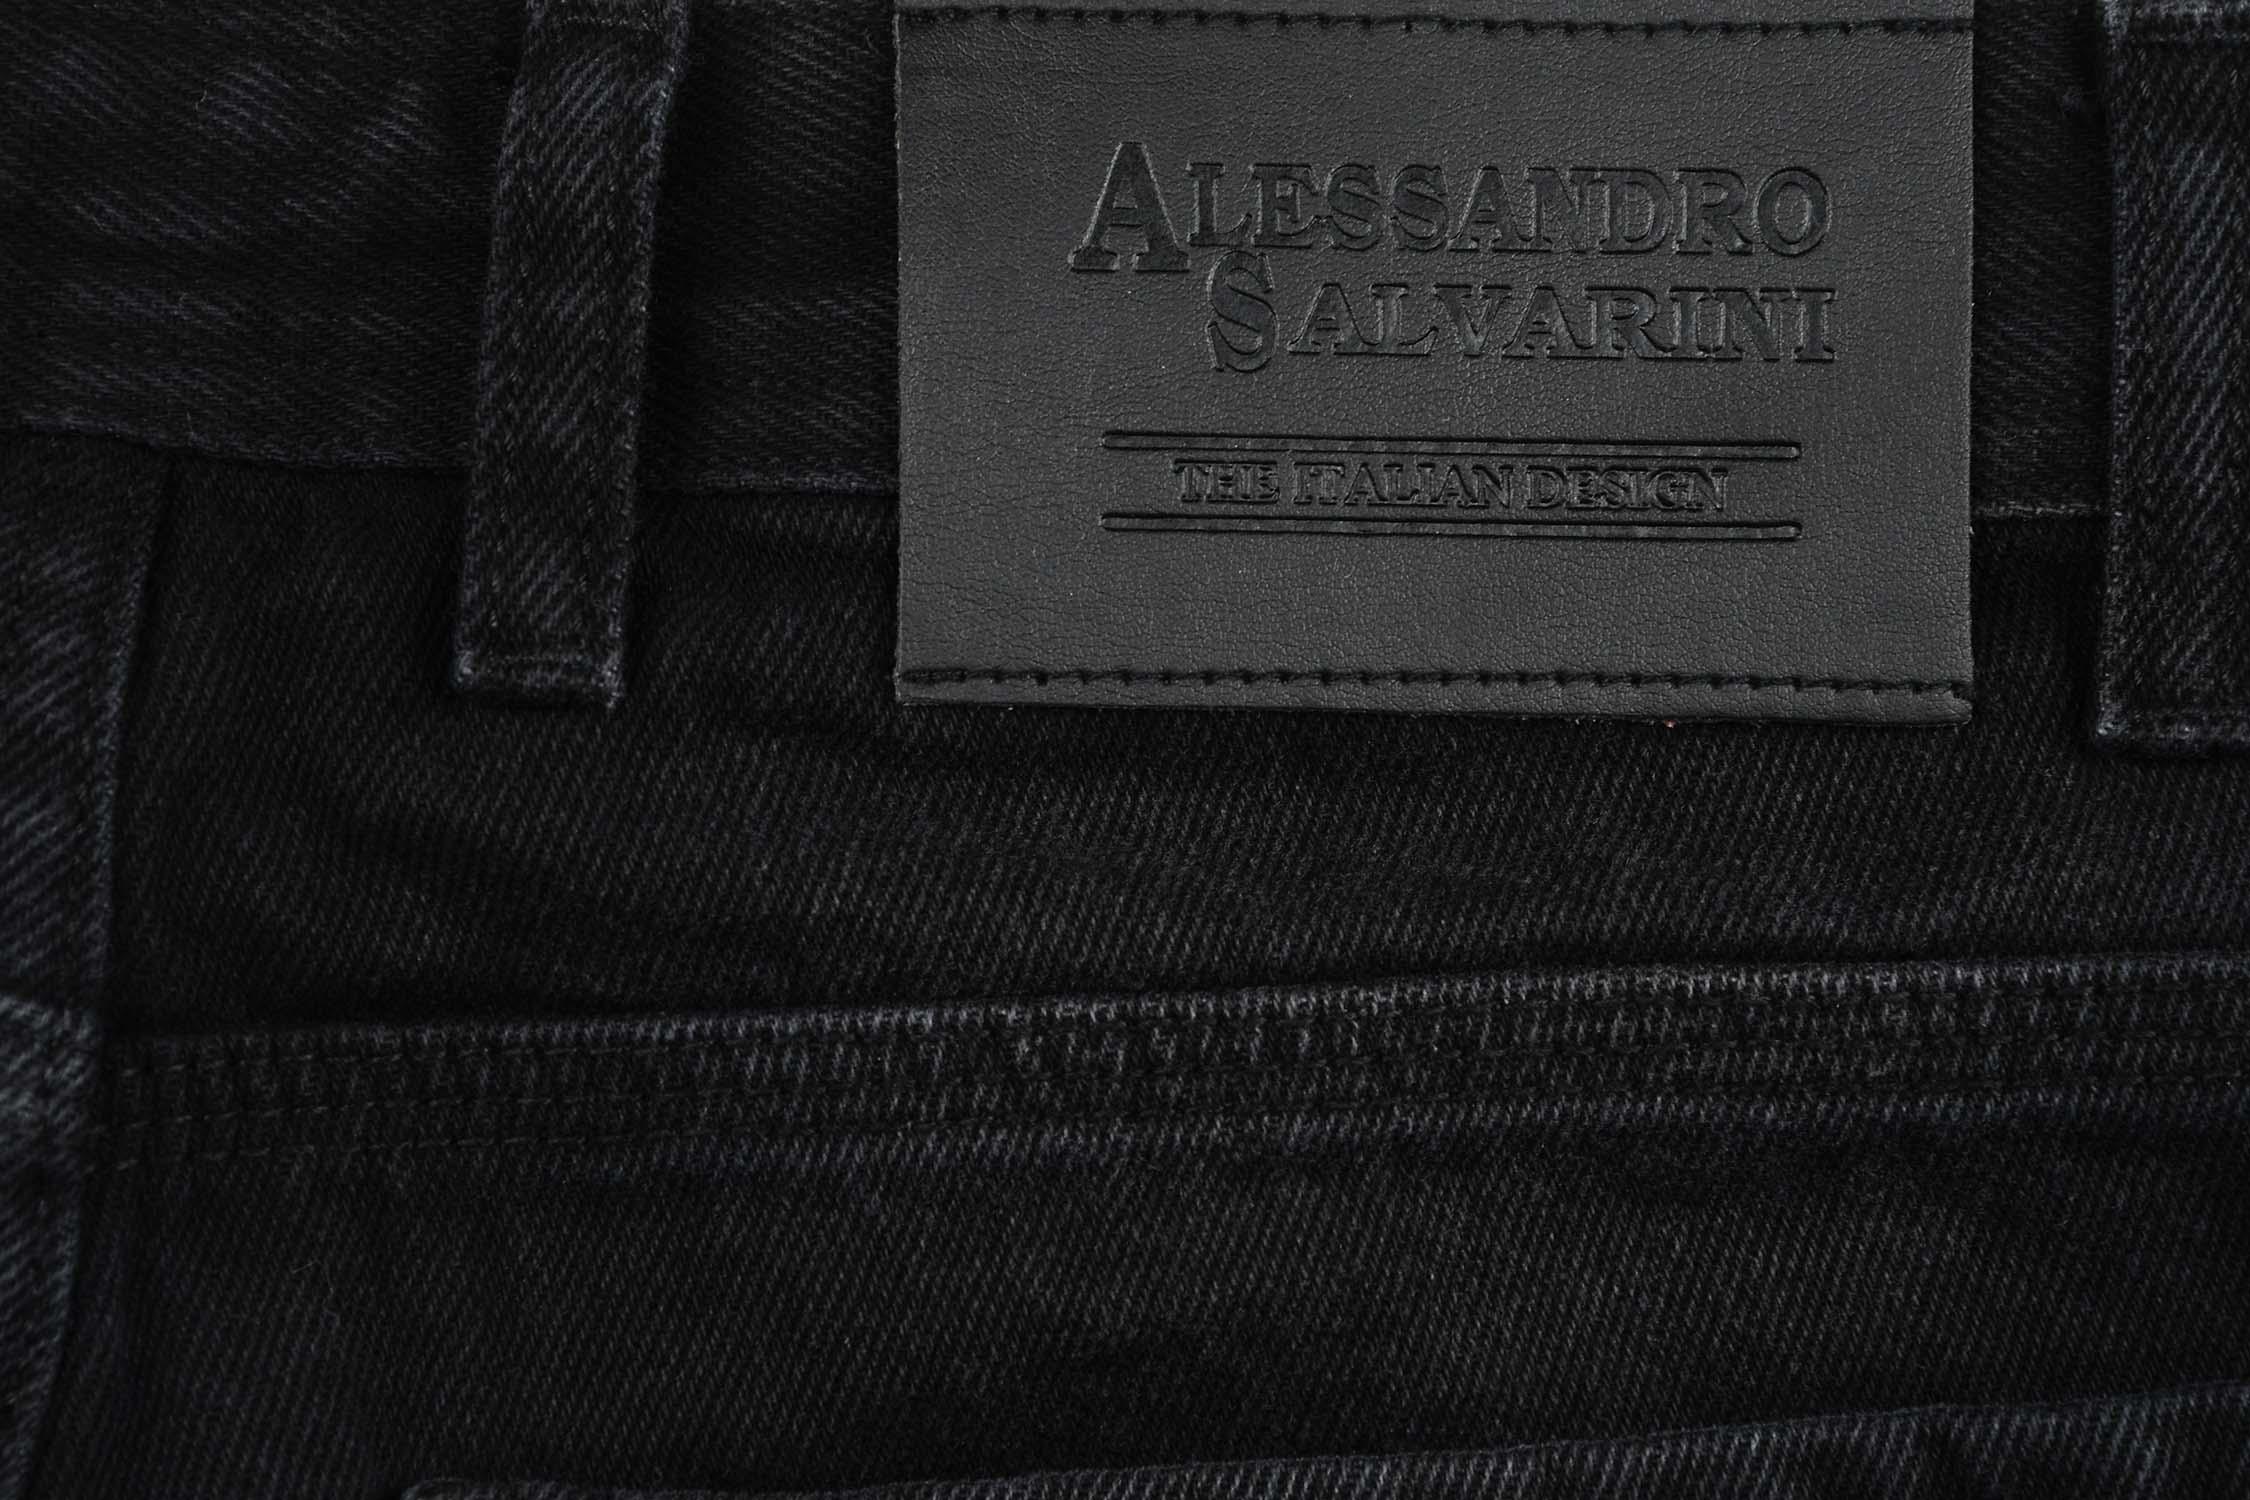 A-Salvarini-Designer-Herren-Jeans-Short-kurze-Sommer-Hose-Jeansshorts-Bermuda Indexbild 32